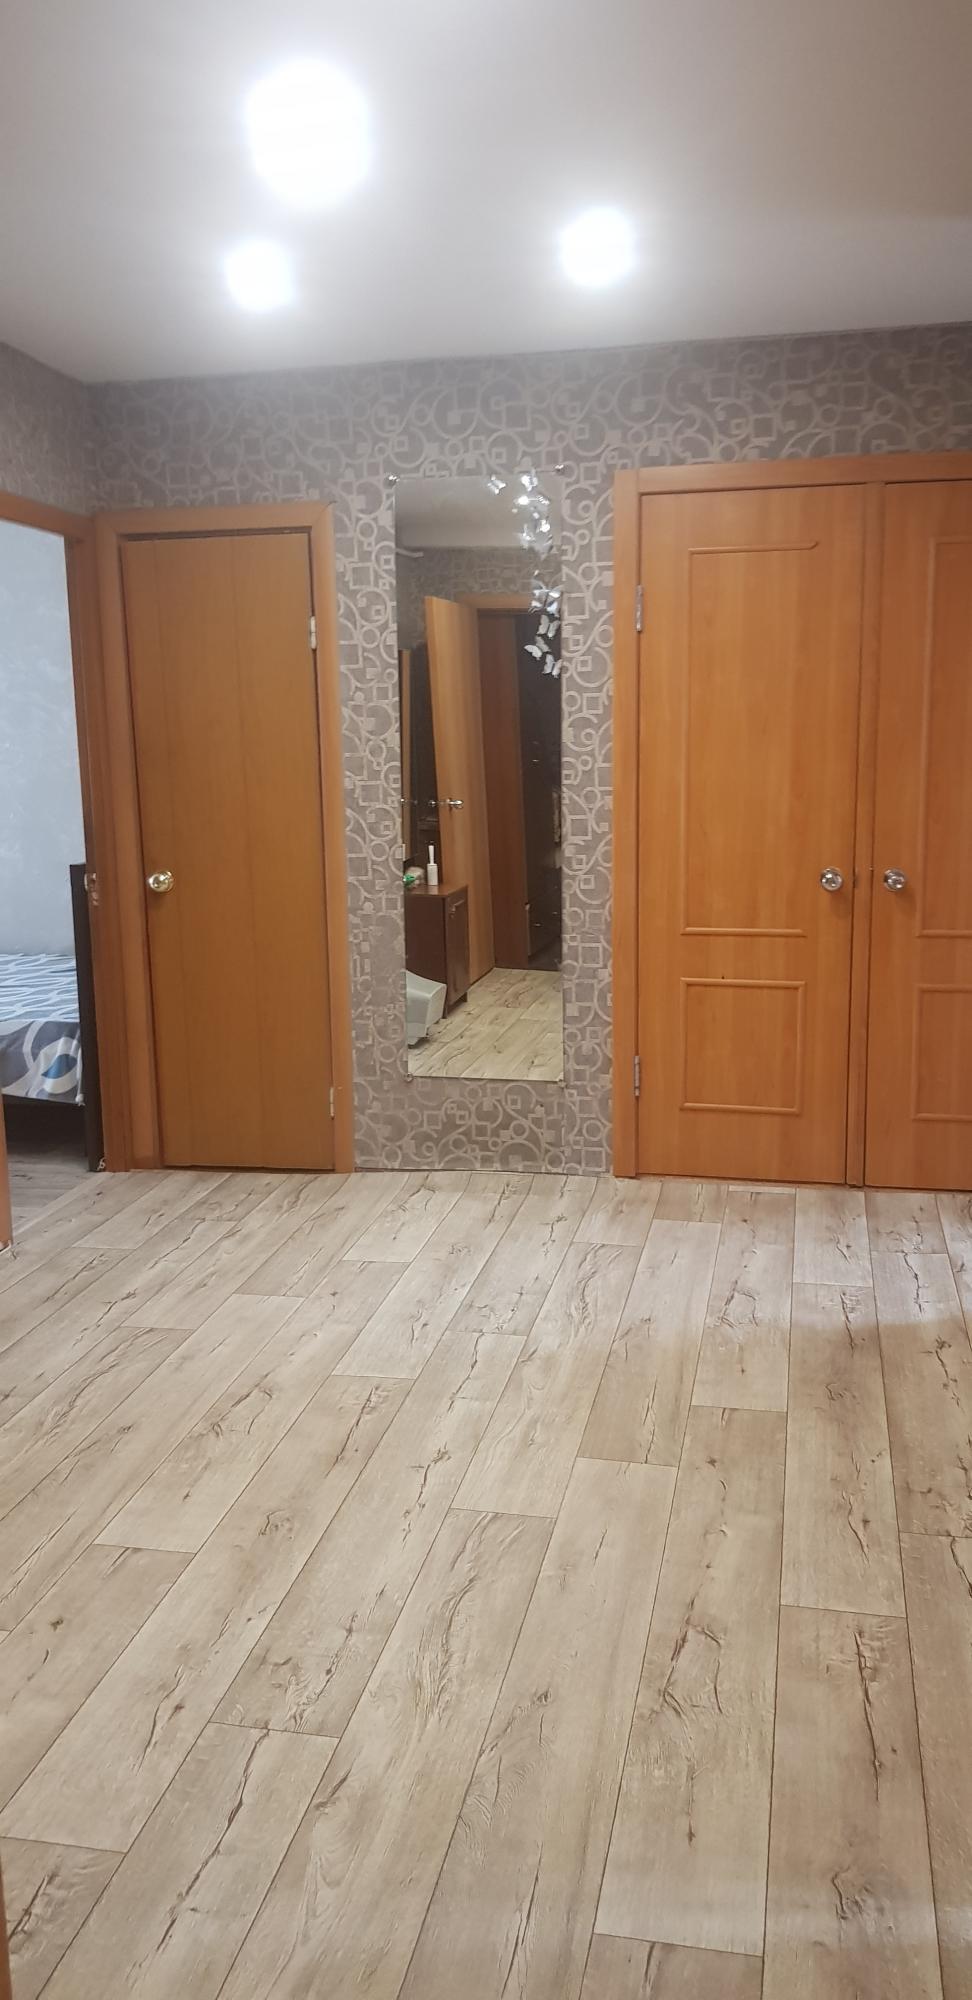 2к квартира улица Краснодарская, 3 | 18000 | аренда в Красноярске фото 5